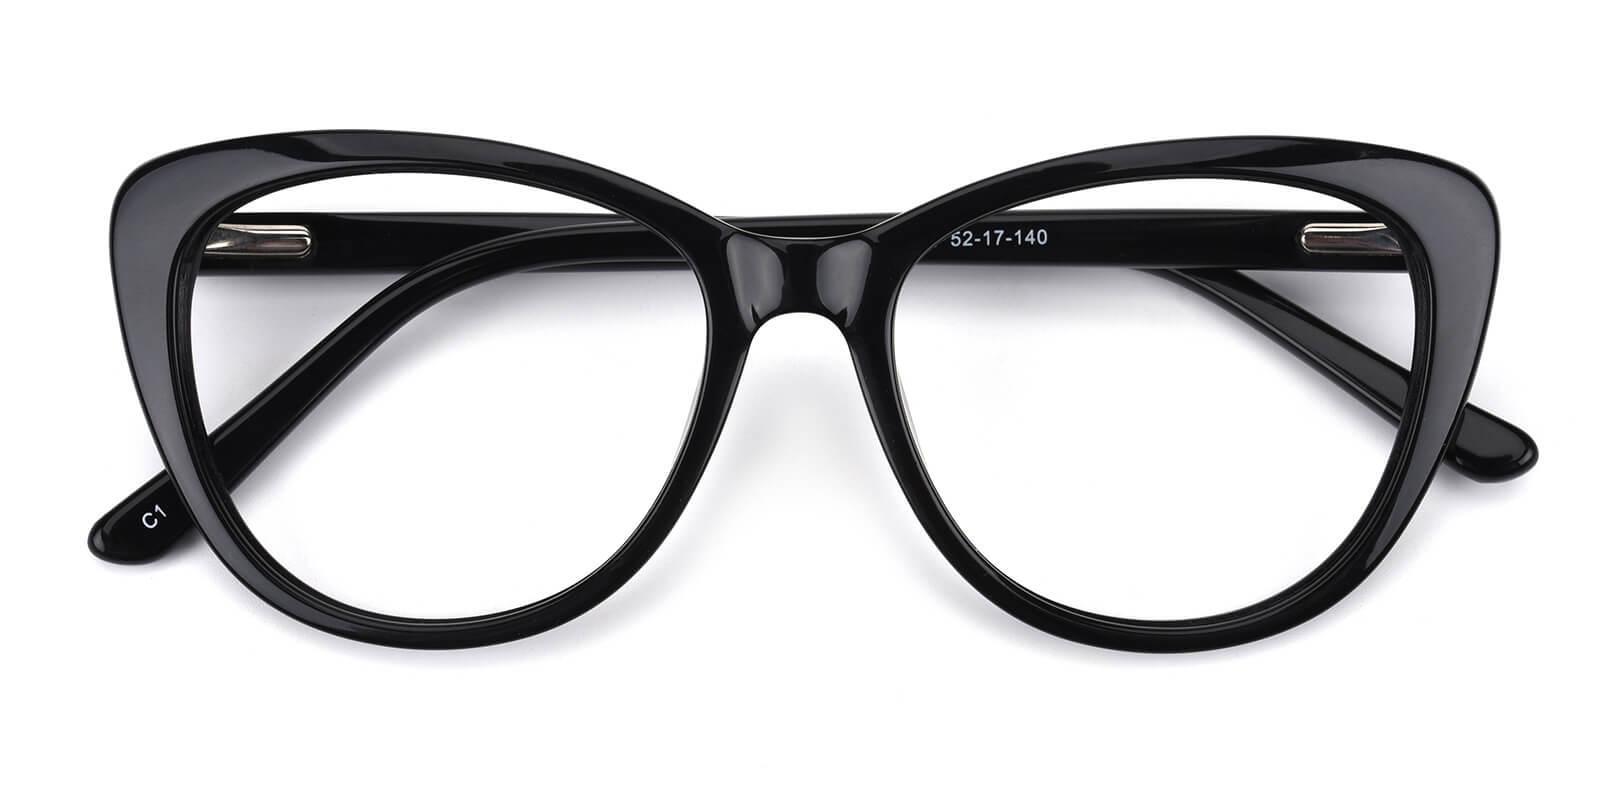 Secretly-Black-Cat-Acetate-Eyeglasses-detail